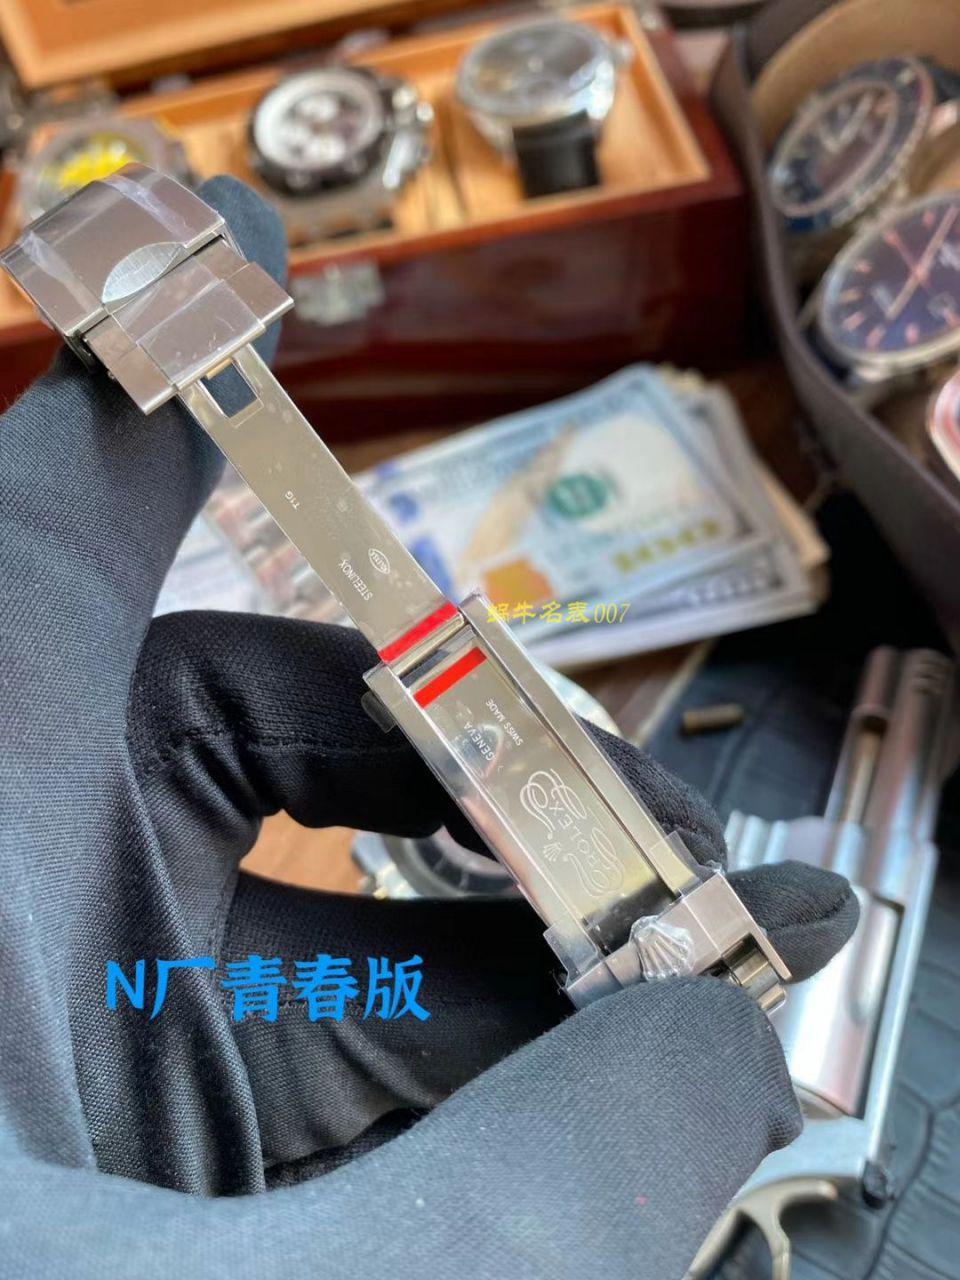 【视频评测】N厂青春版高仿劳力士绿水鬼116610LV-97200手表 / R650Nlvshuigui